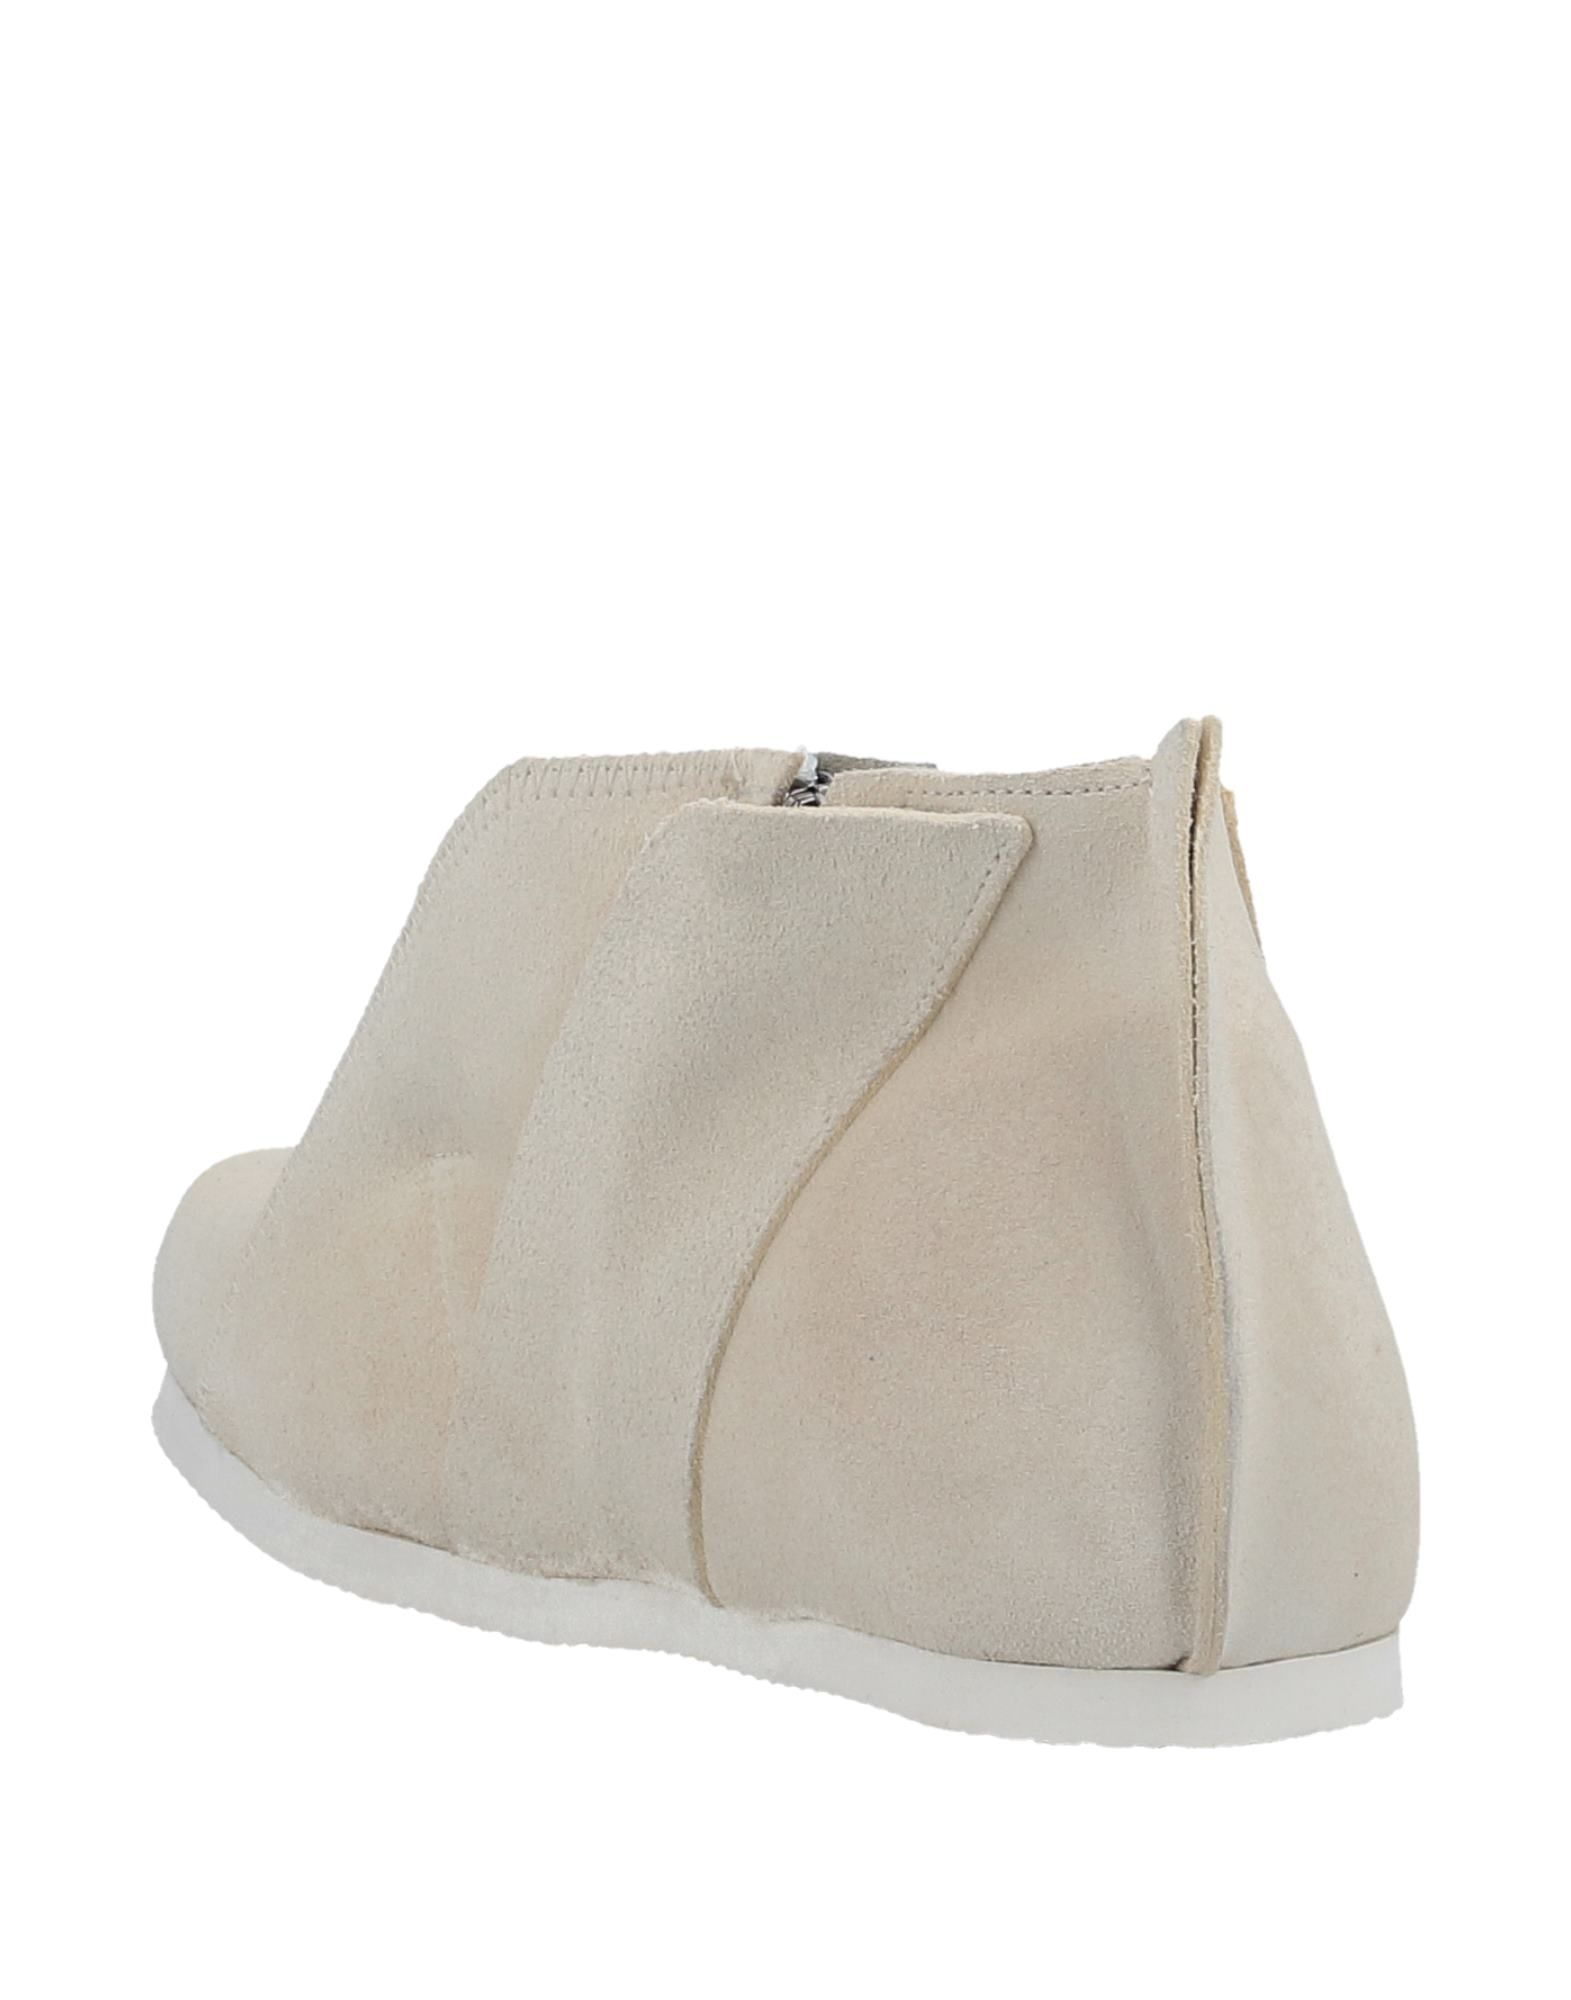 Stilvolle billige Damen Schuhe Peter Non Stiefelette Damen billige  11508746CD 5e579b